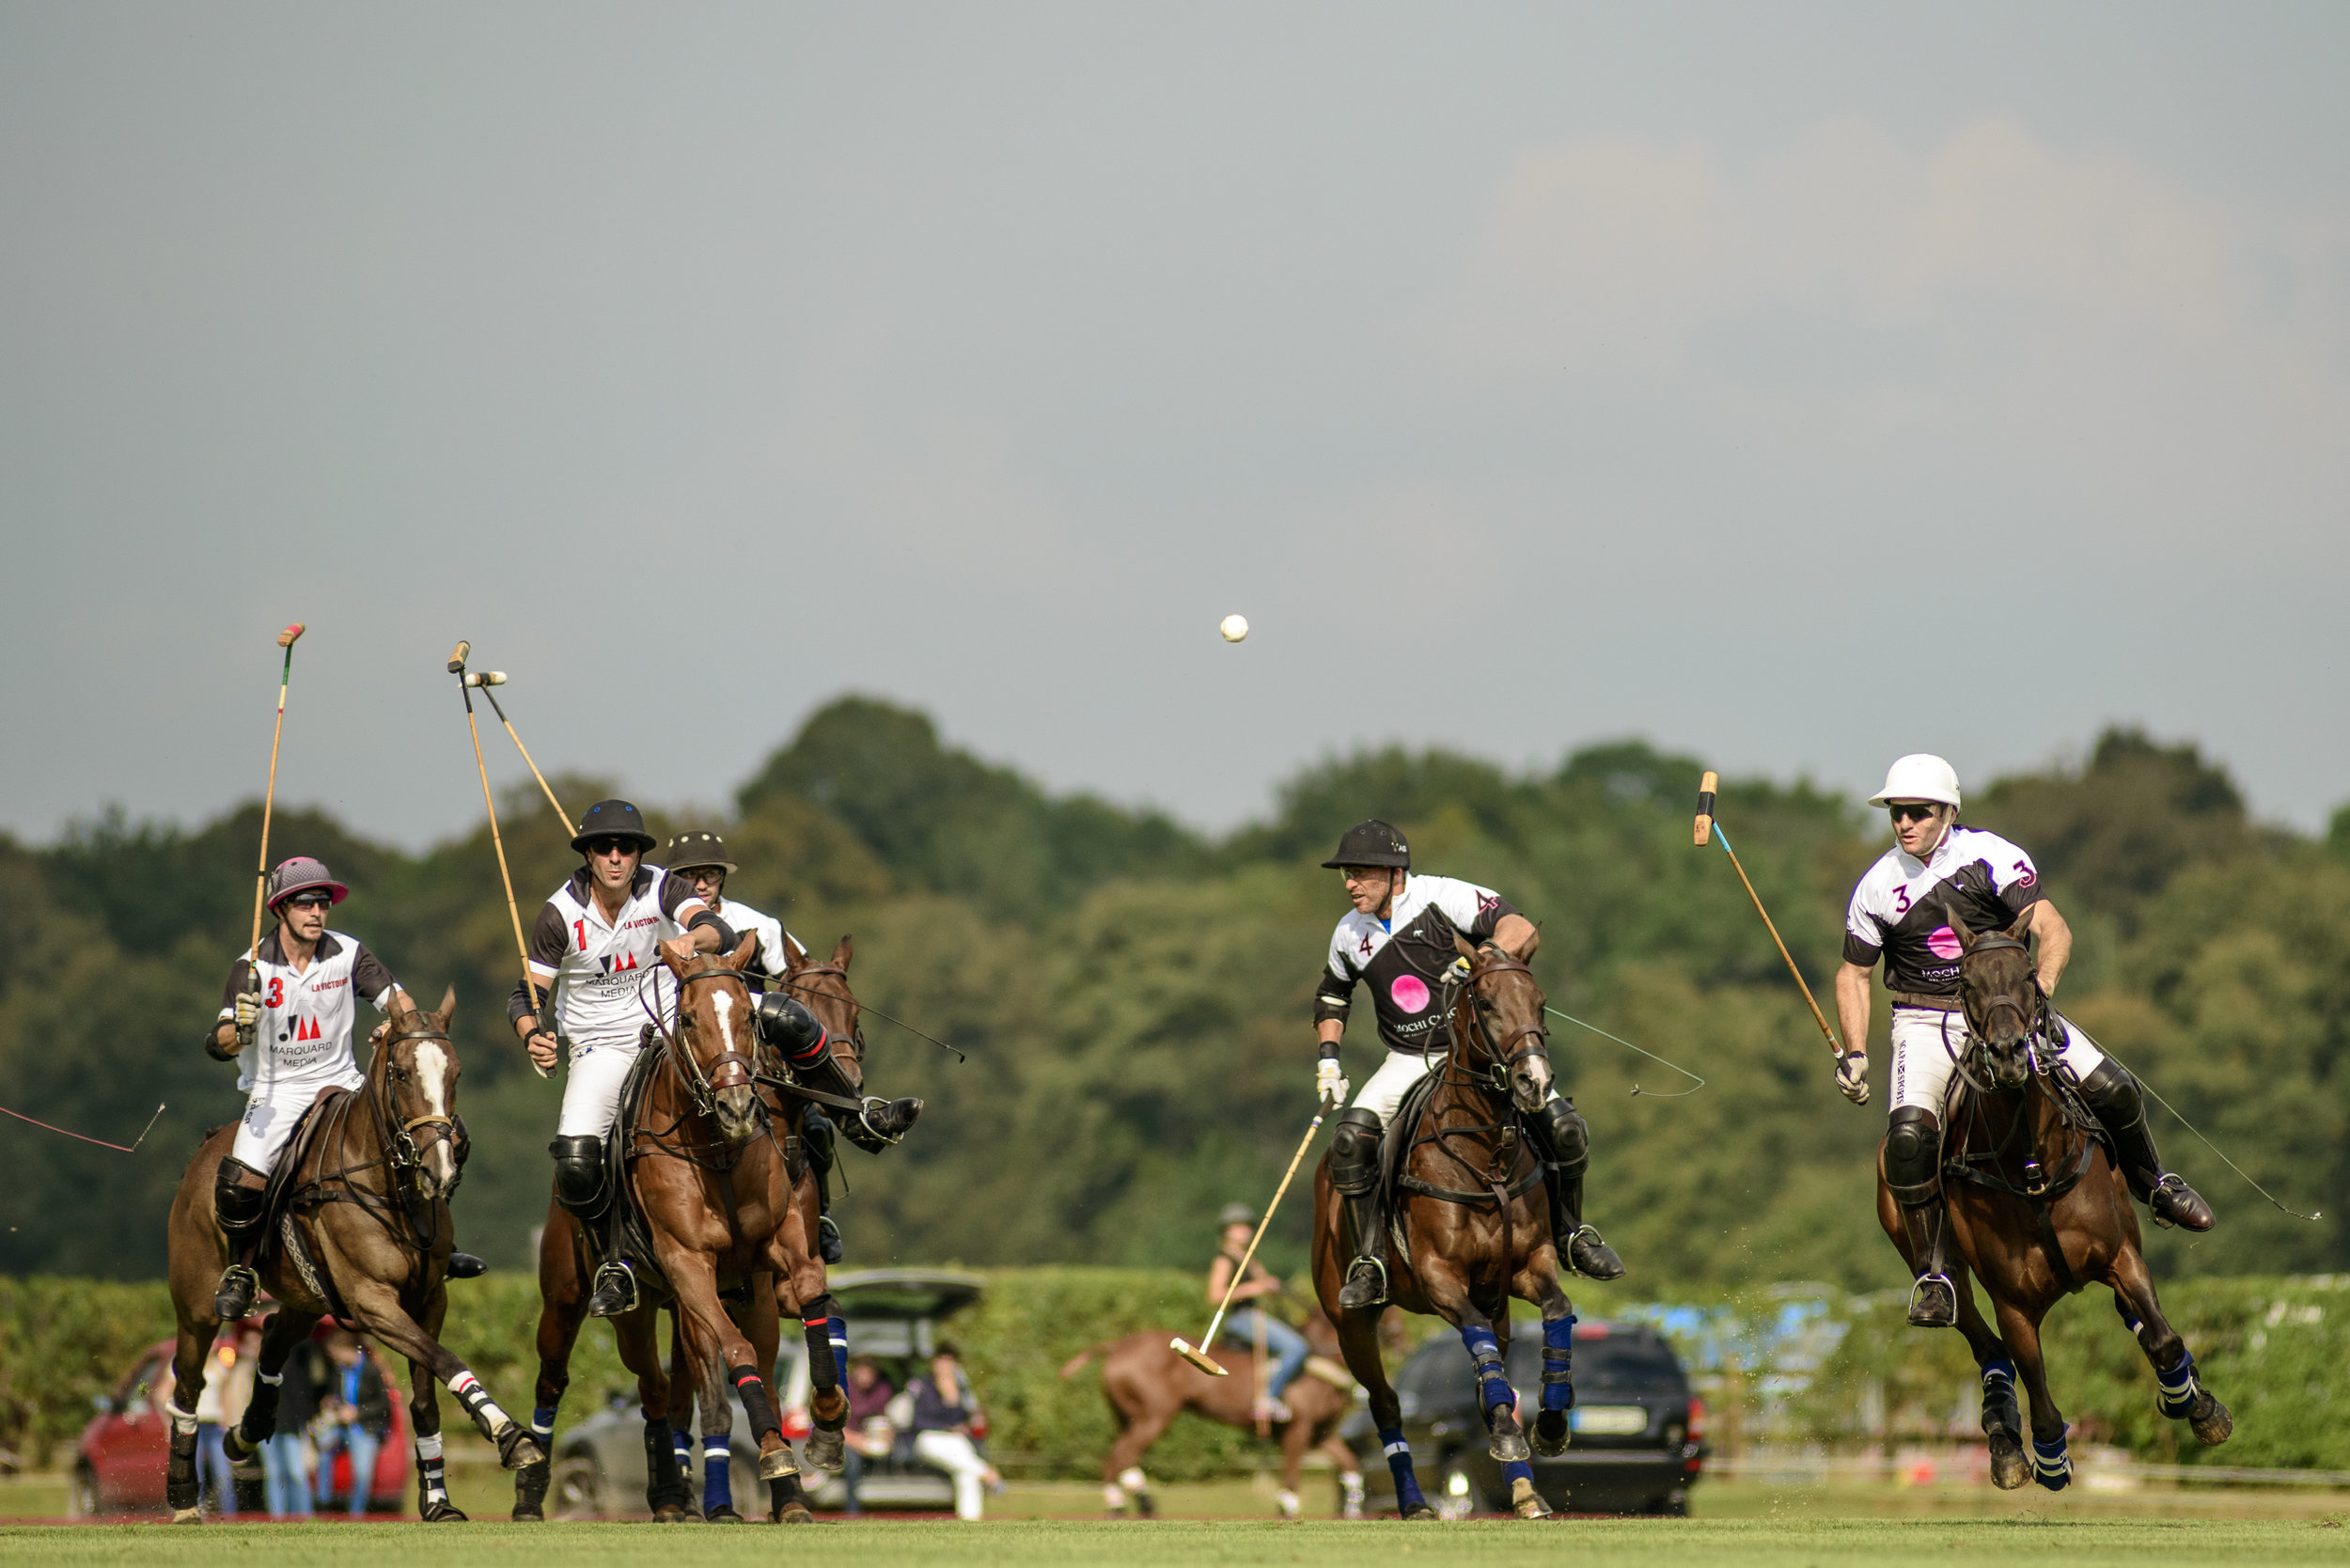 Match au Polo Club du Domaine de Chantilly  Game at the Chantilly Polo Club